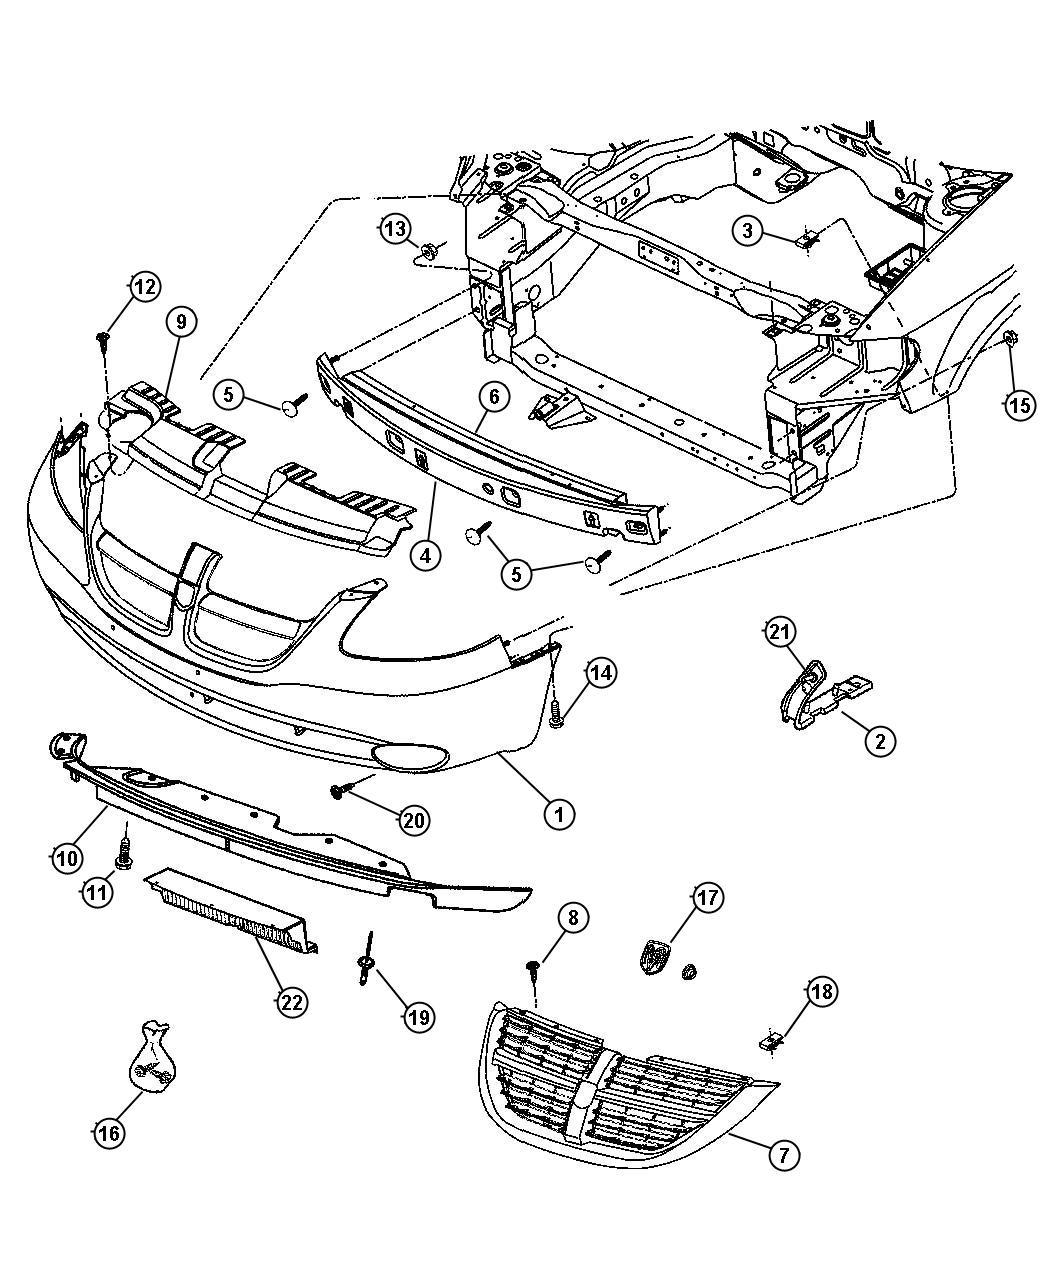 Chevy Caprice Fuse Box Chevy Auto Fuse Box Diagram